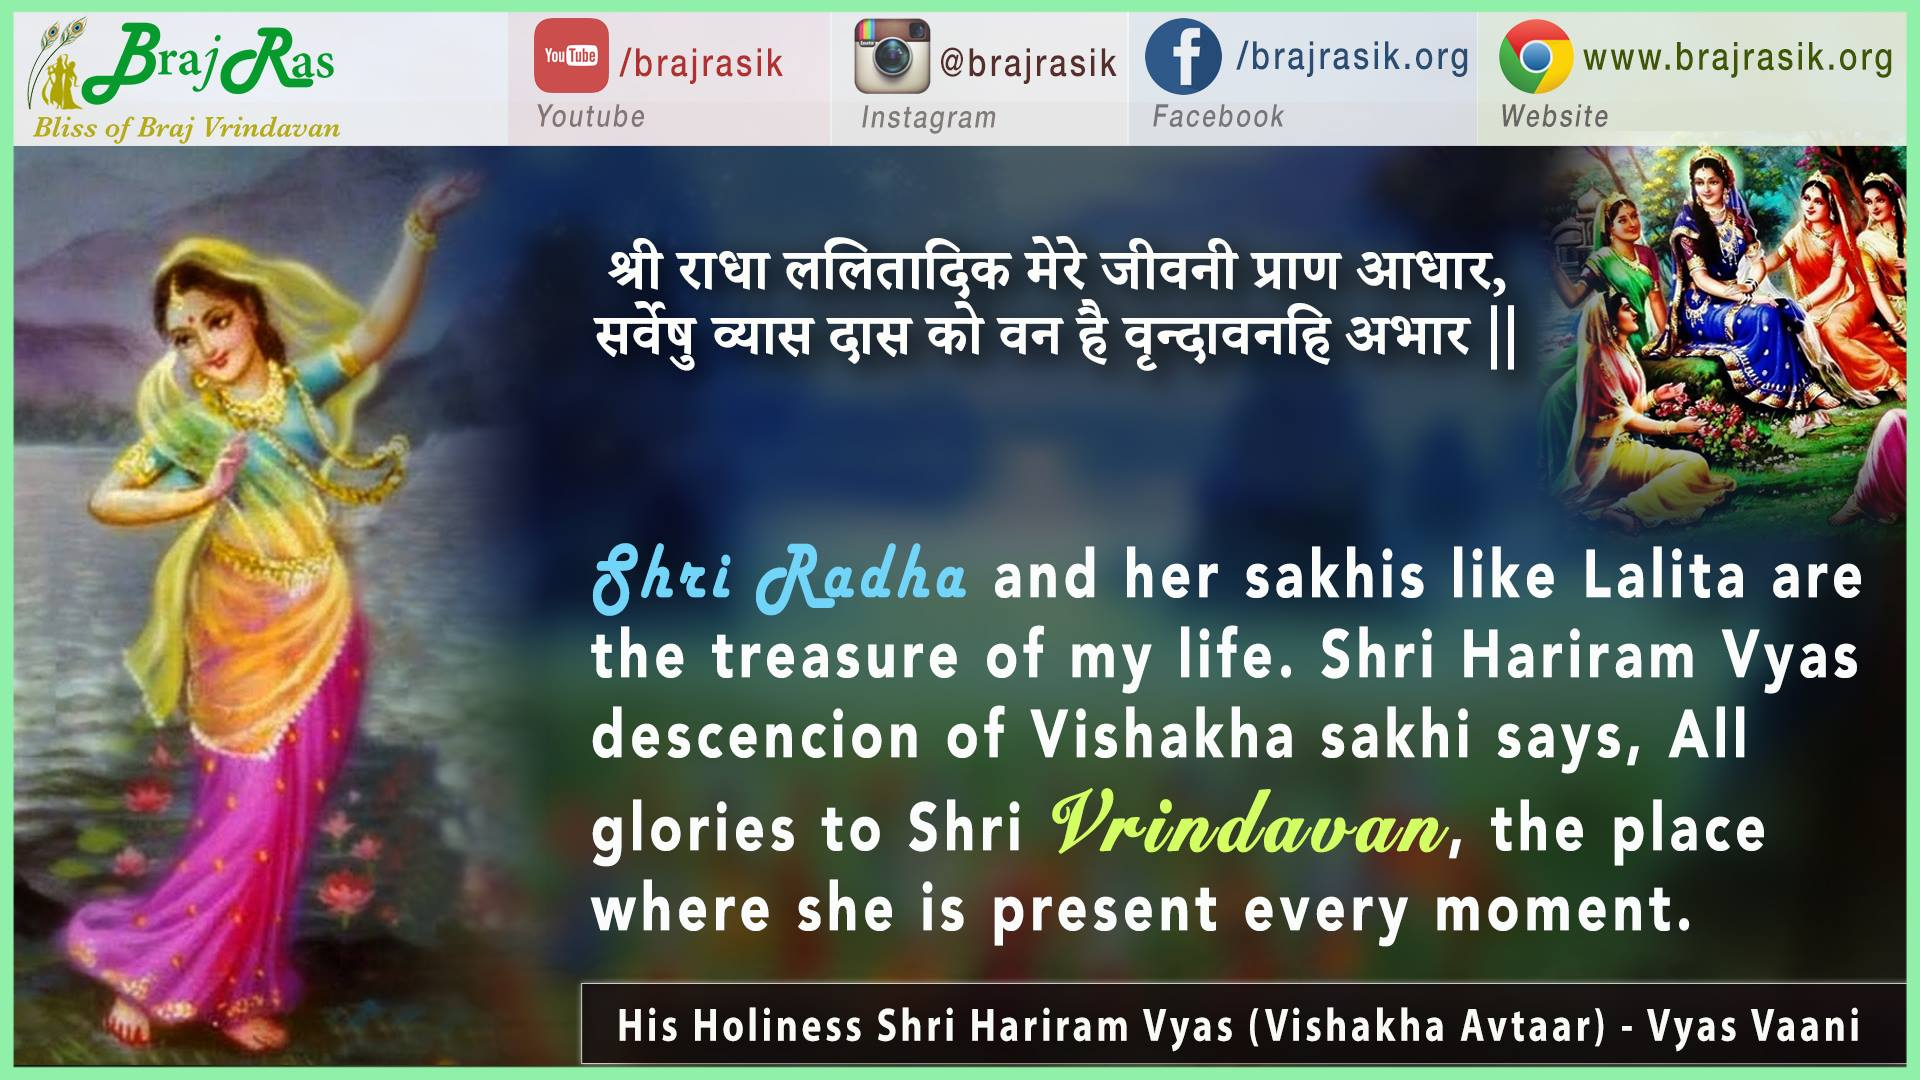 Shri Radha Lalitadik Mere Jeevani Praan Aadhar - Quote By Shri Hariram Vyas